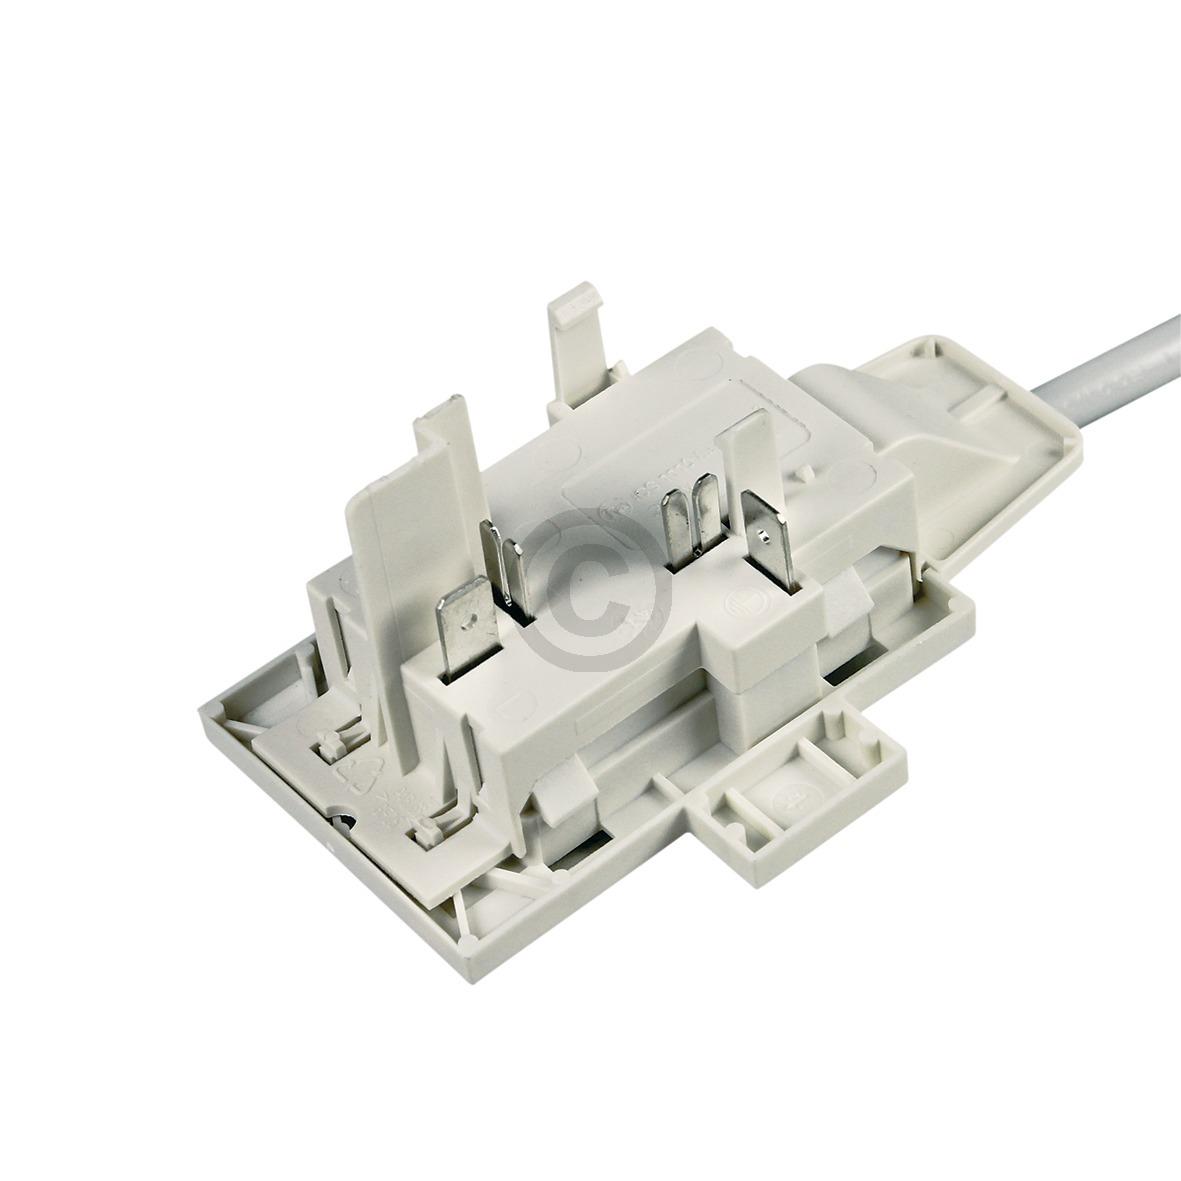 Kabel Spülmaschinen-Anschlusskabel OT! 00483581 483581 Bosch, Siemens, Neff